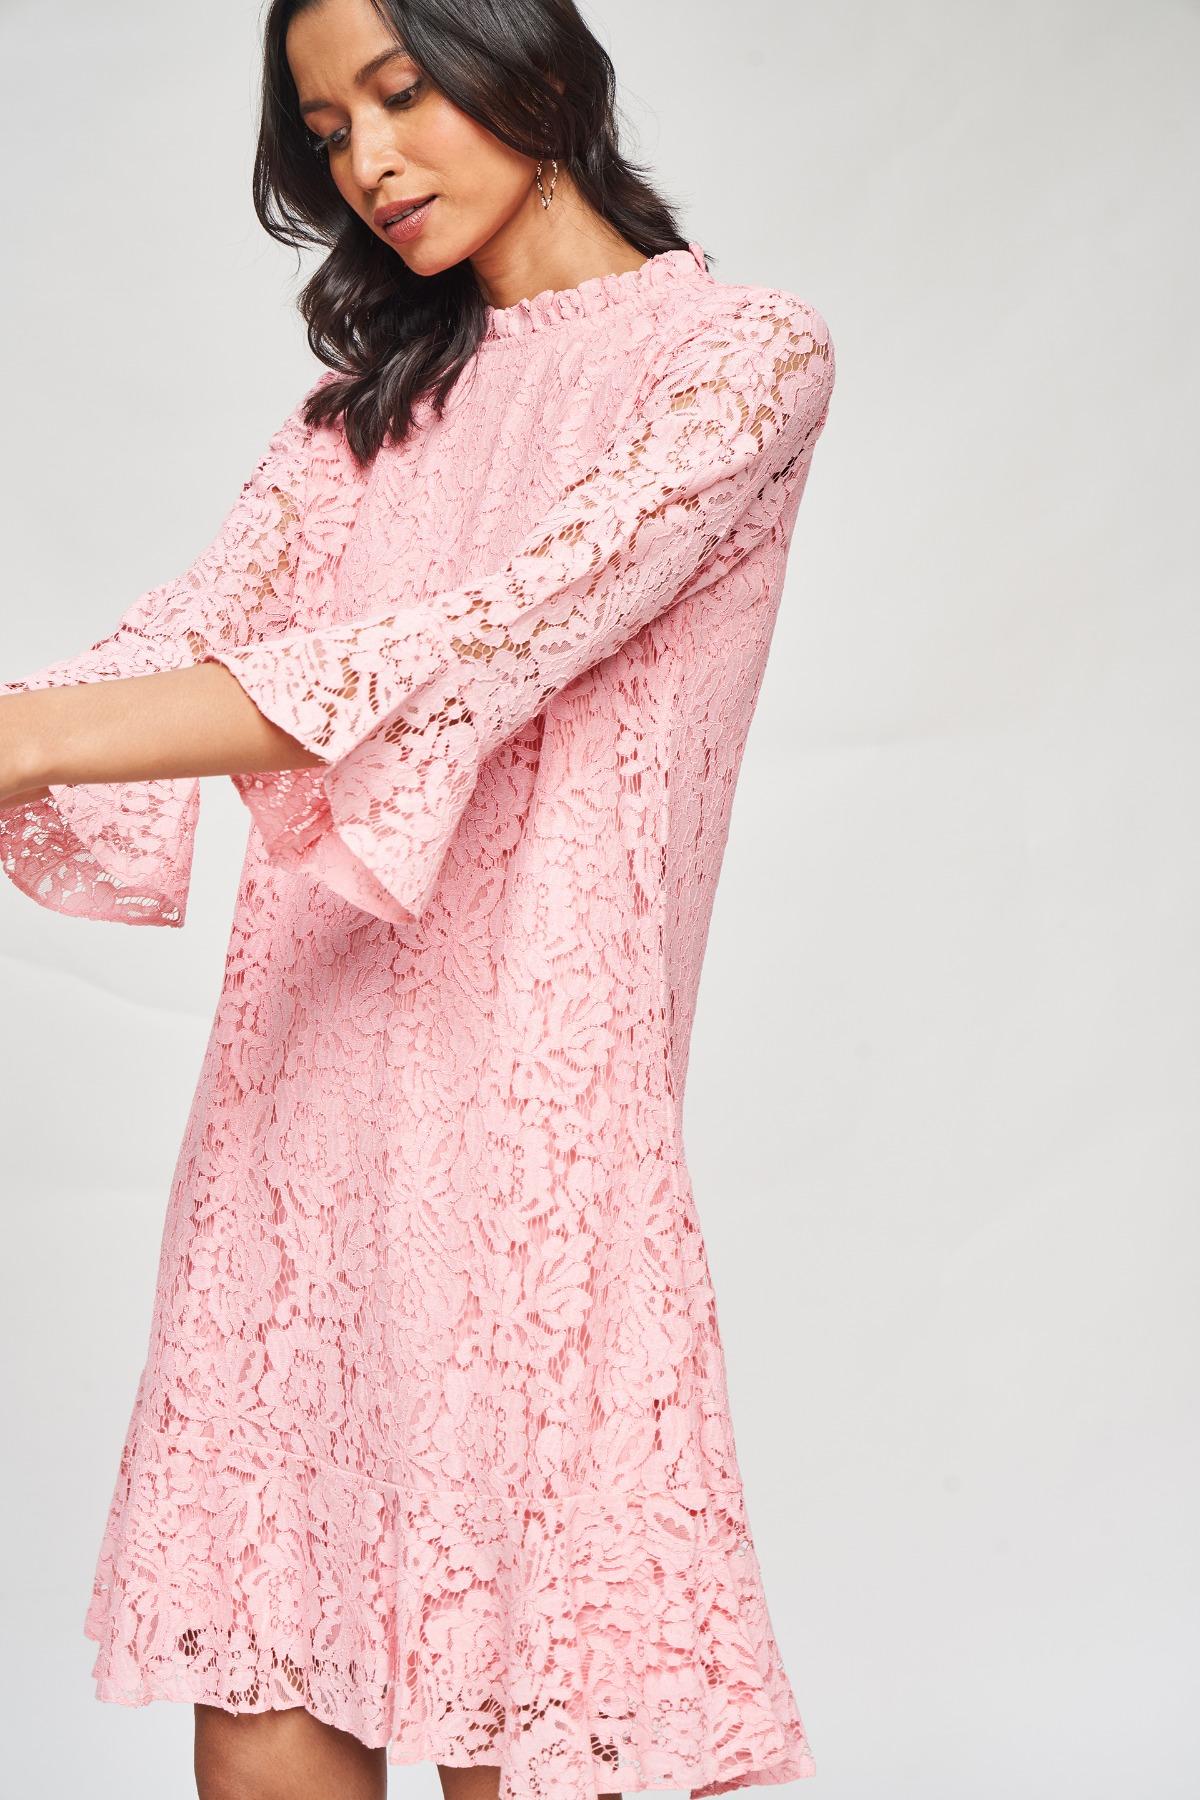 AND | Blush Self Design A-Line Dress